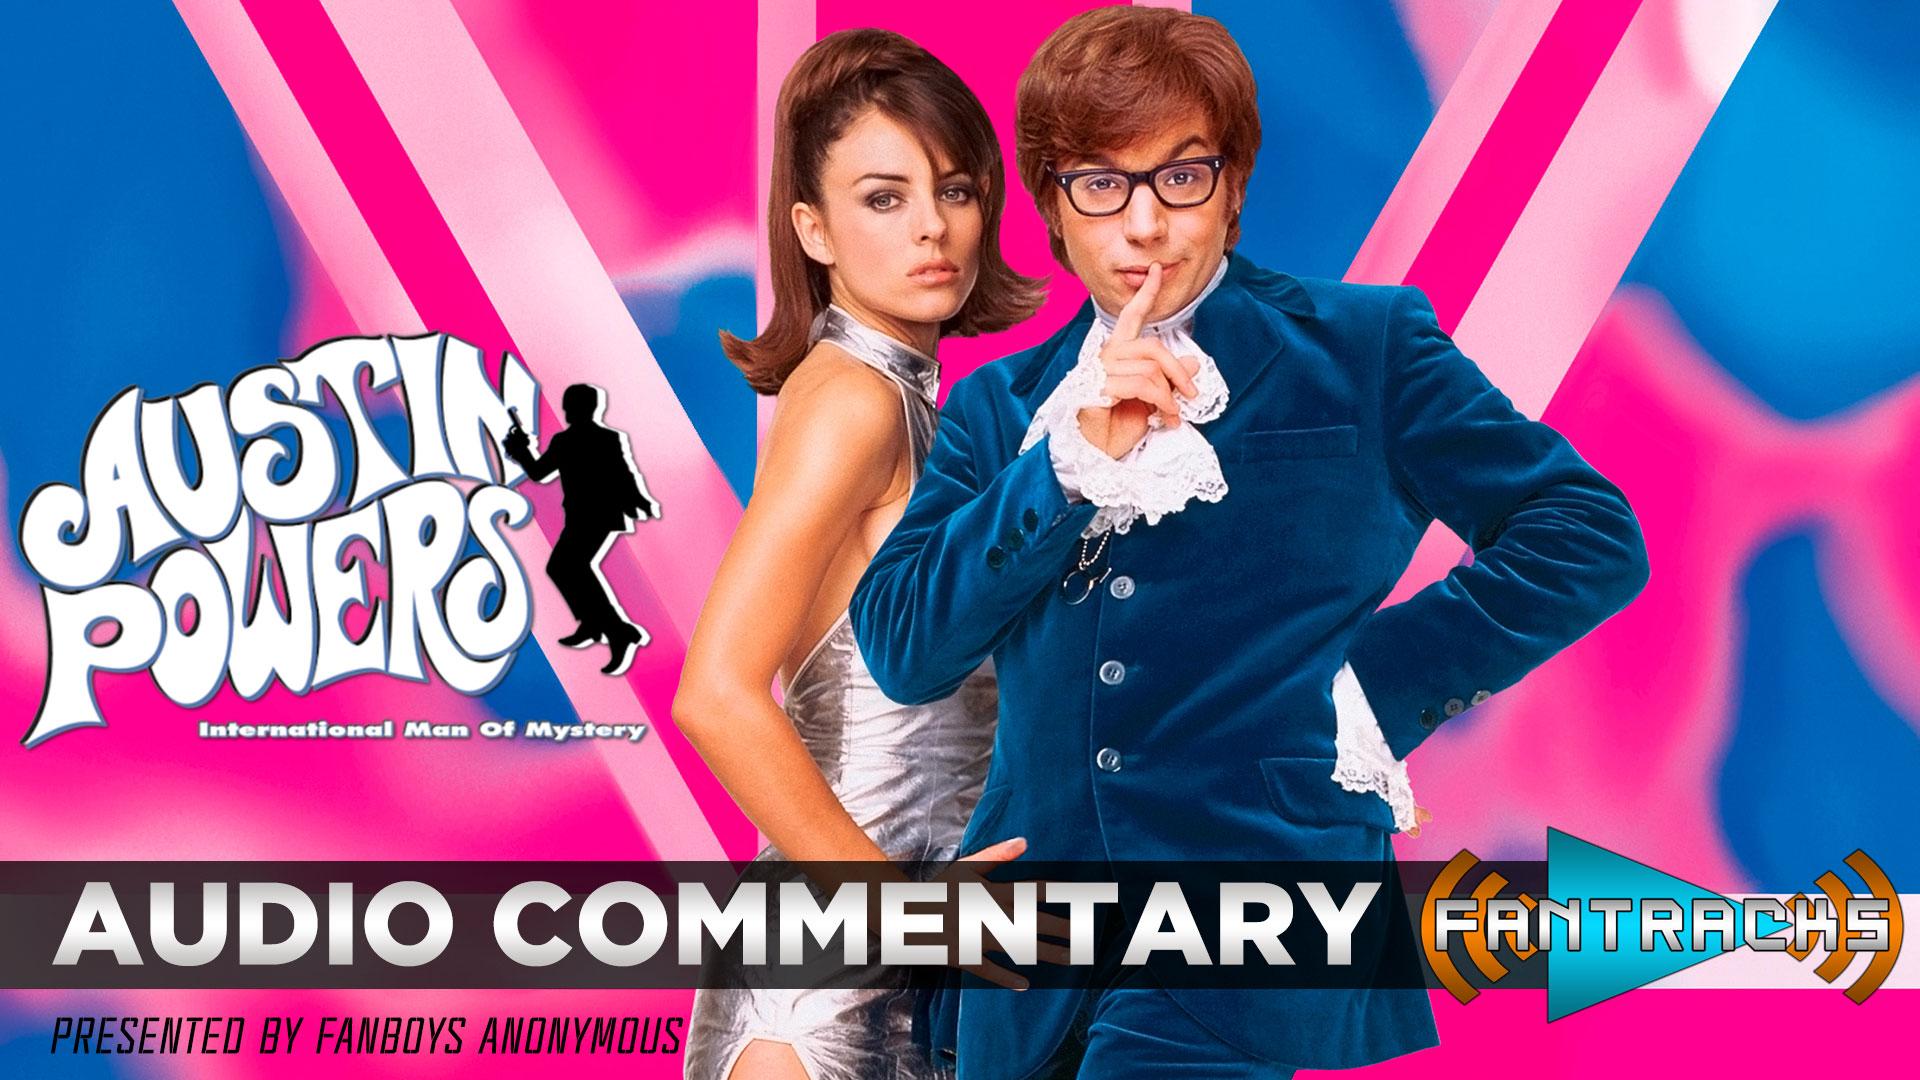 FanTracks Austin Powers: International Man of Mystery audio commentary